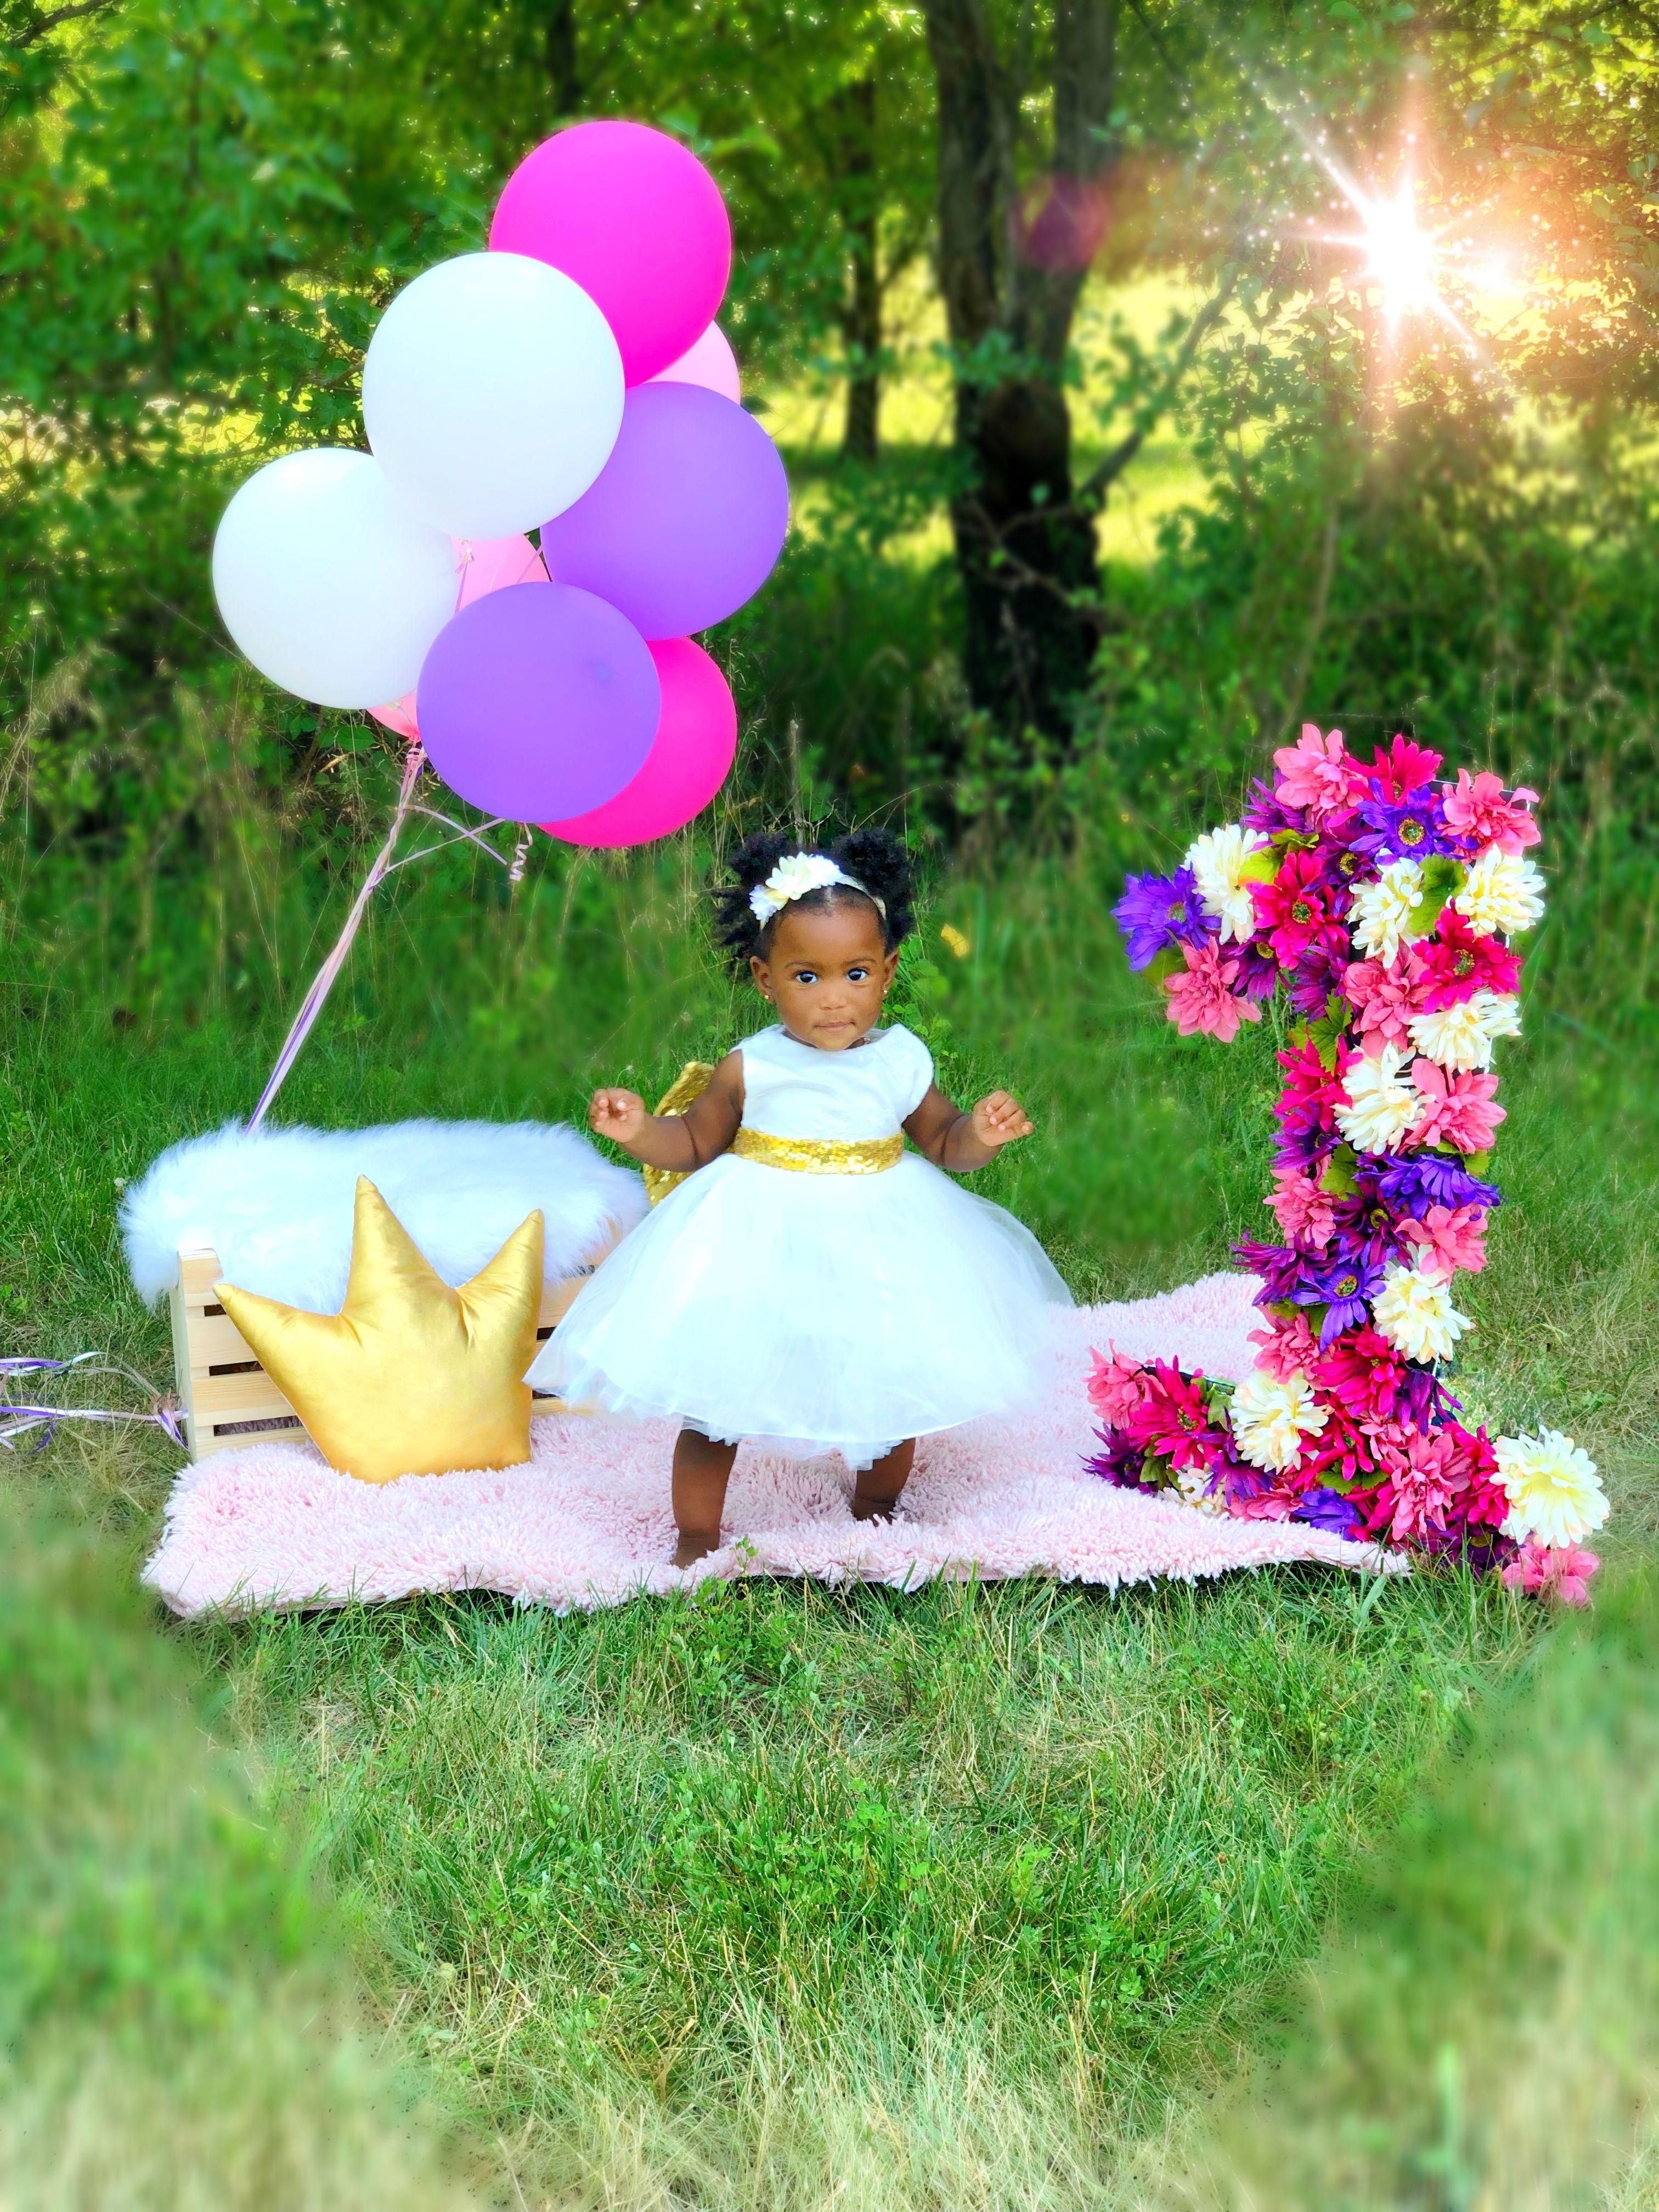 birthday photoshoot ideas for baby girl